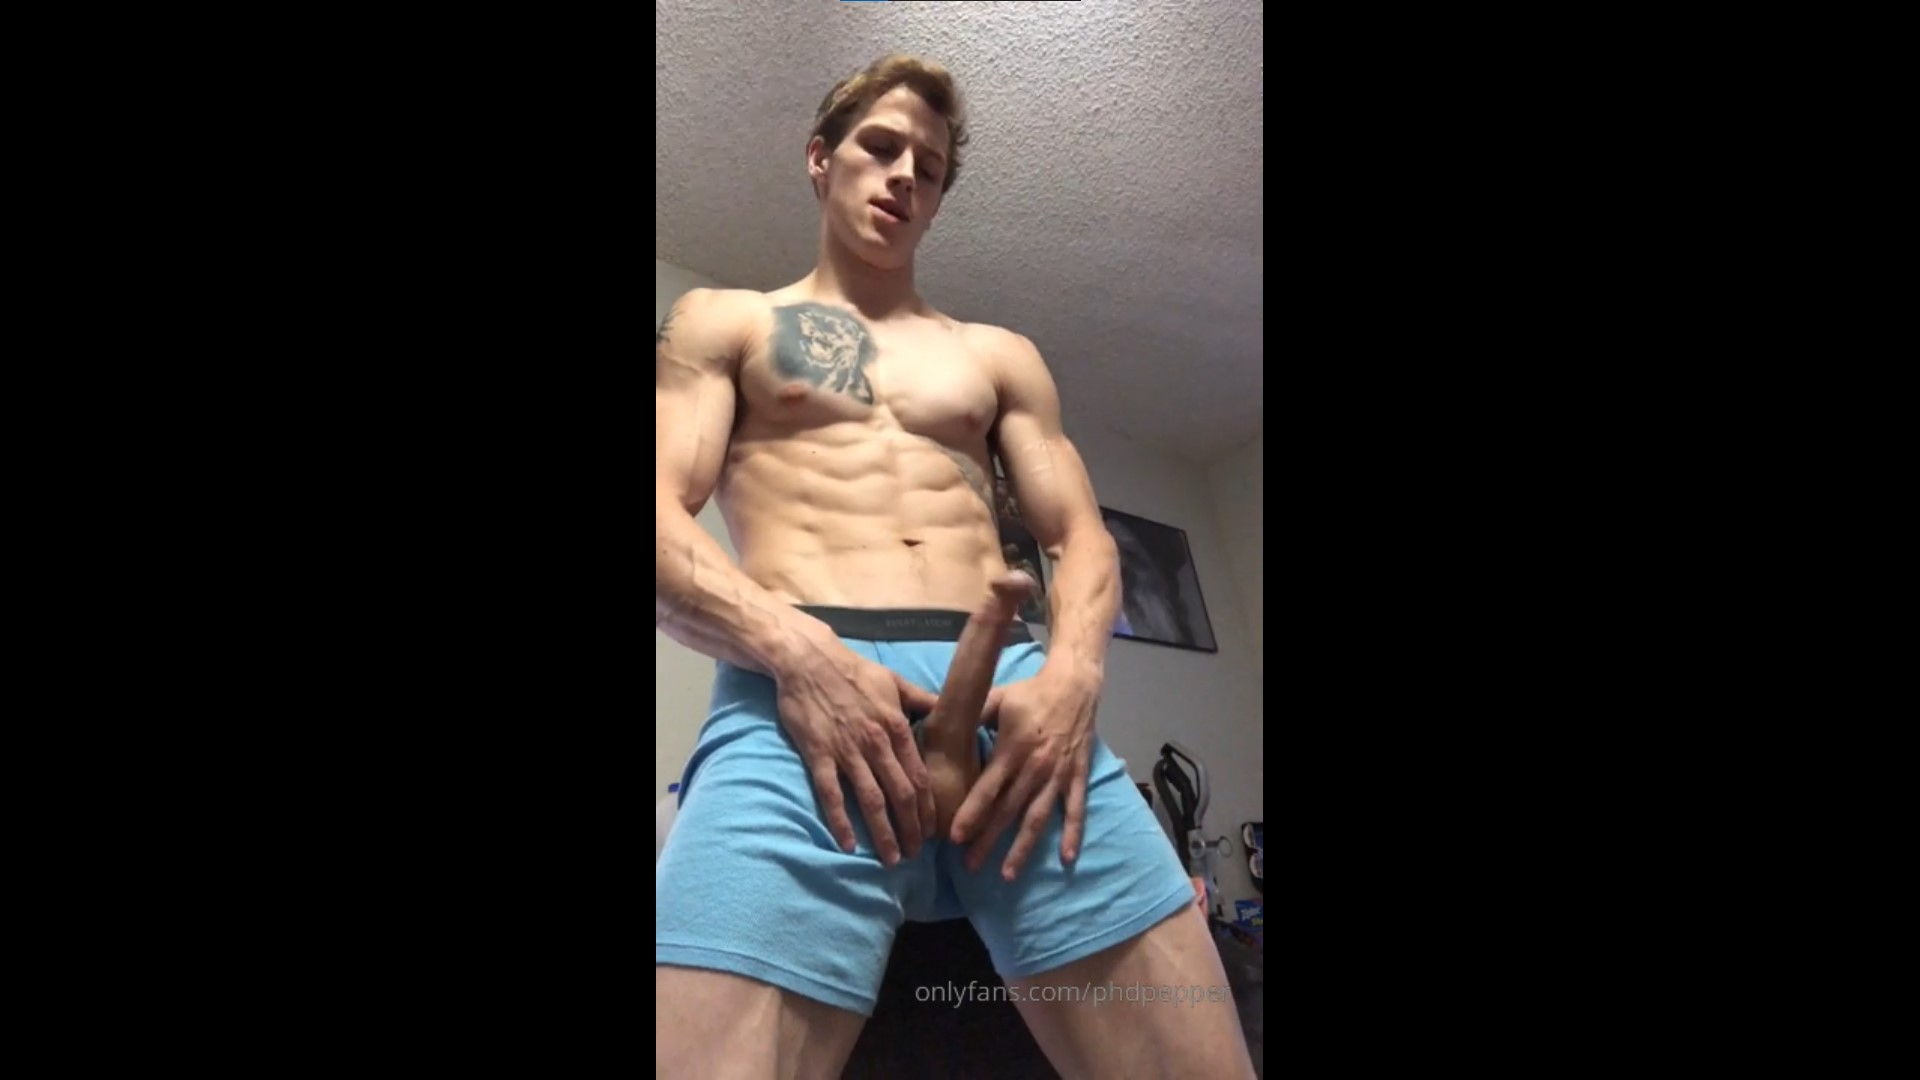 Jerking off and shooting a big load - Daniel Jensen (phdpepper)